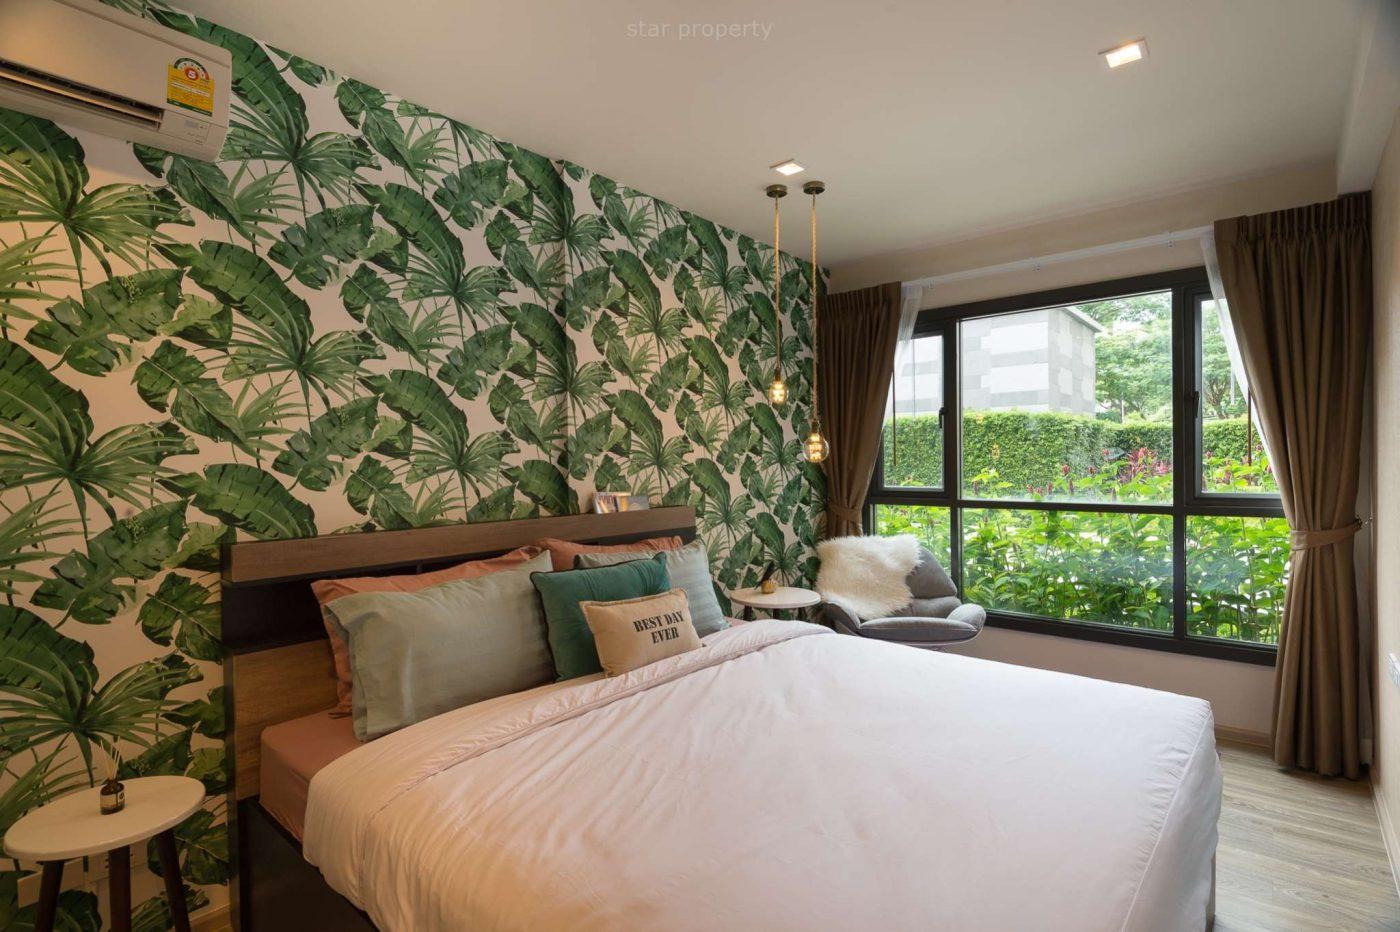 1 bedroom Villa near town for rent